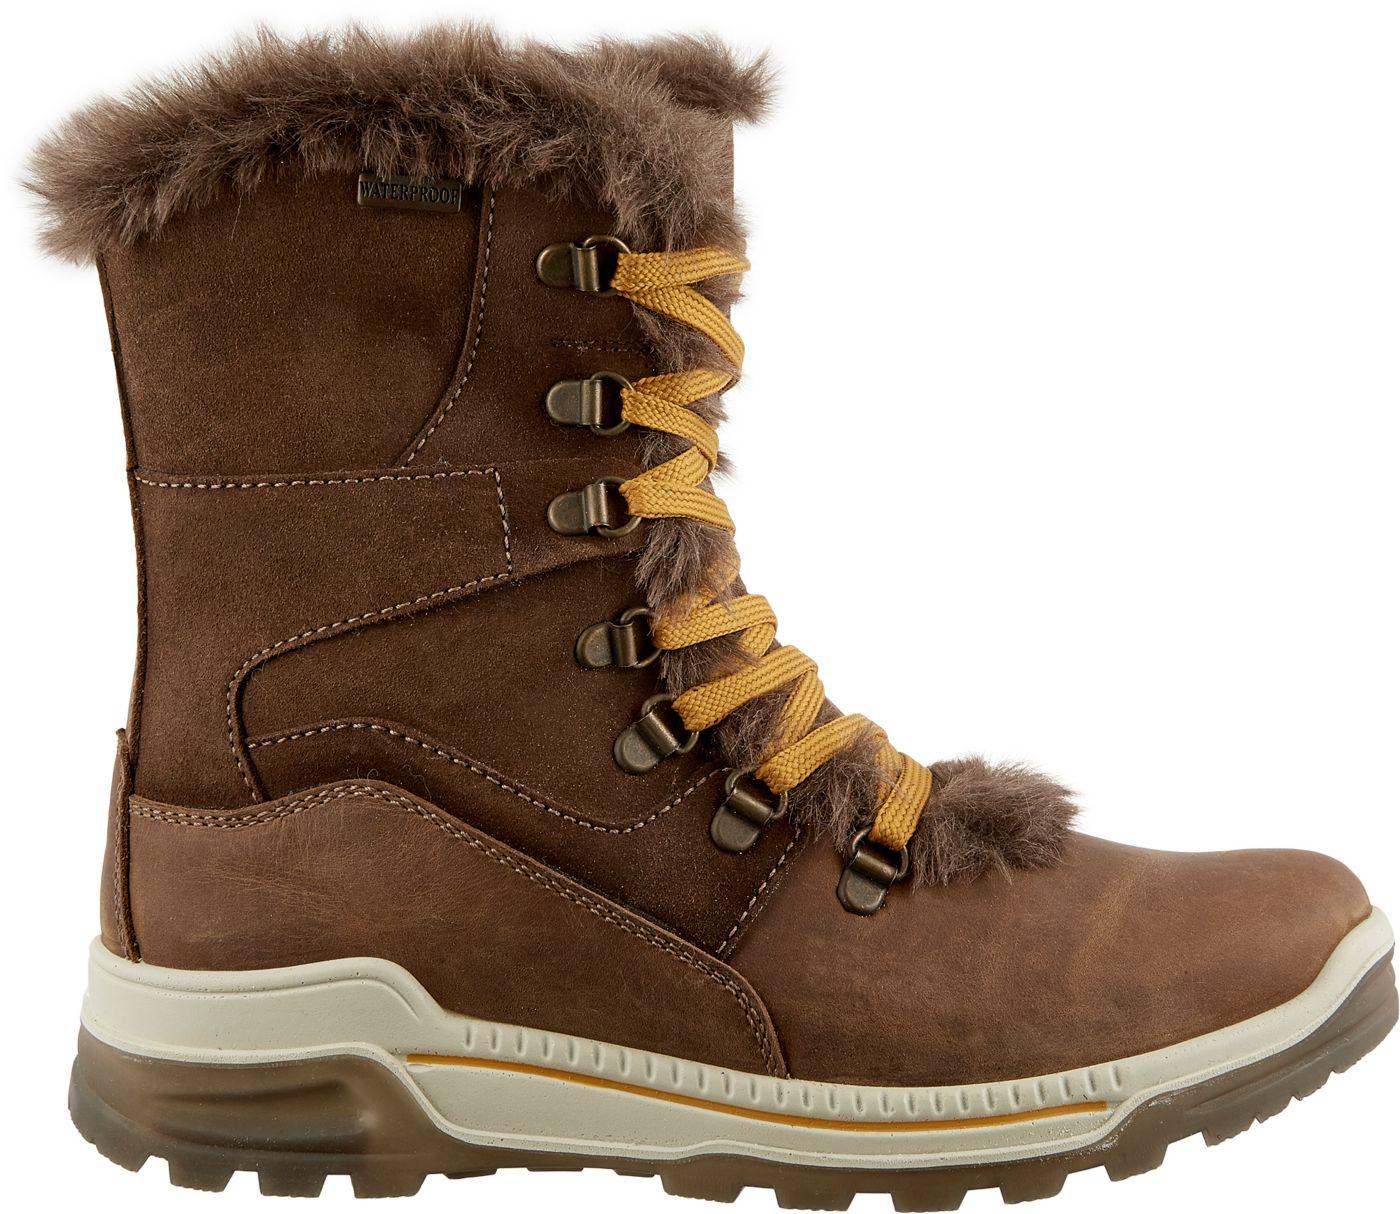 Alpine Design Women's Benedetta Waterproof Winter Boots